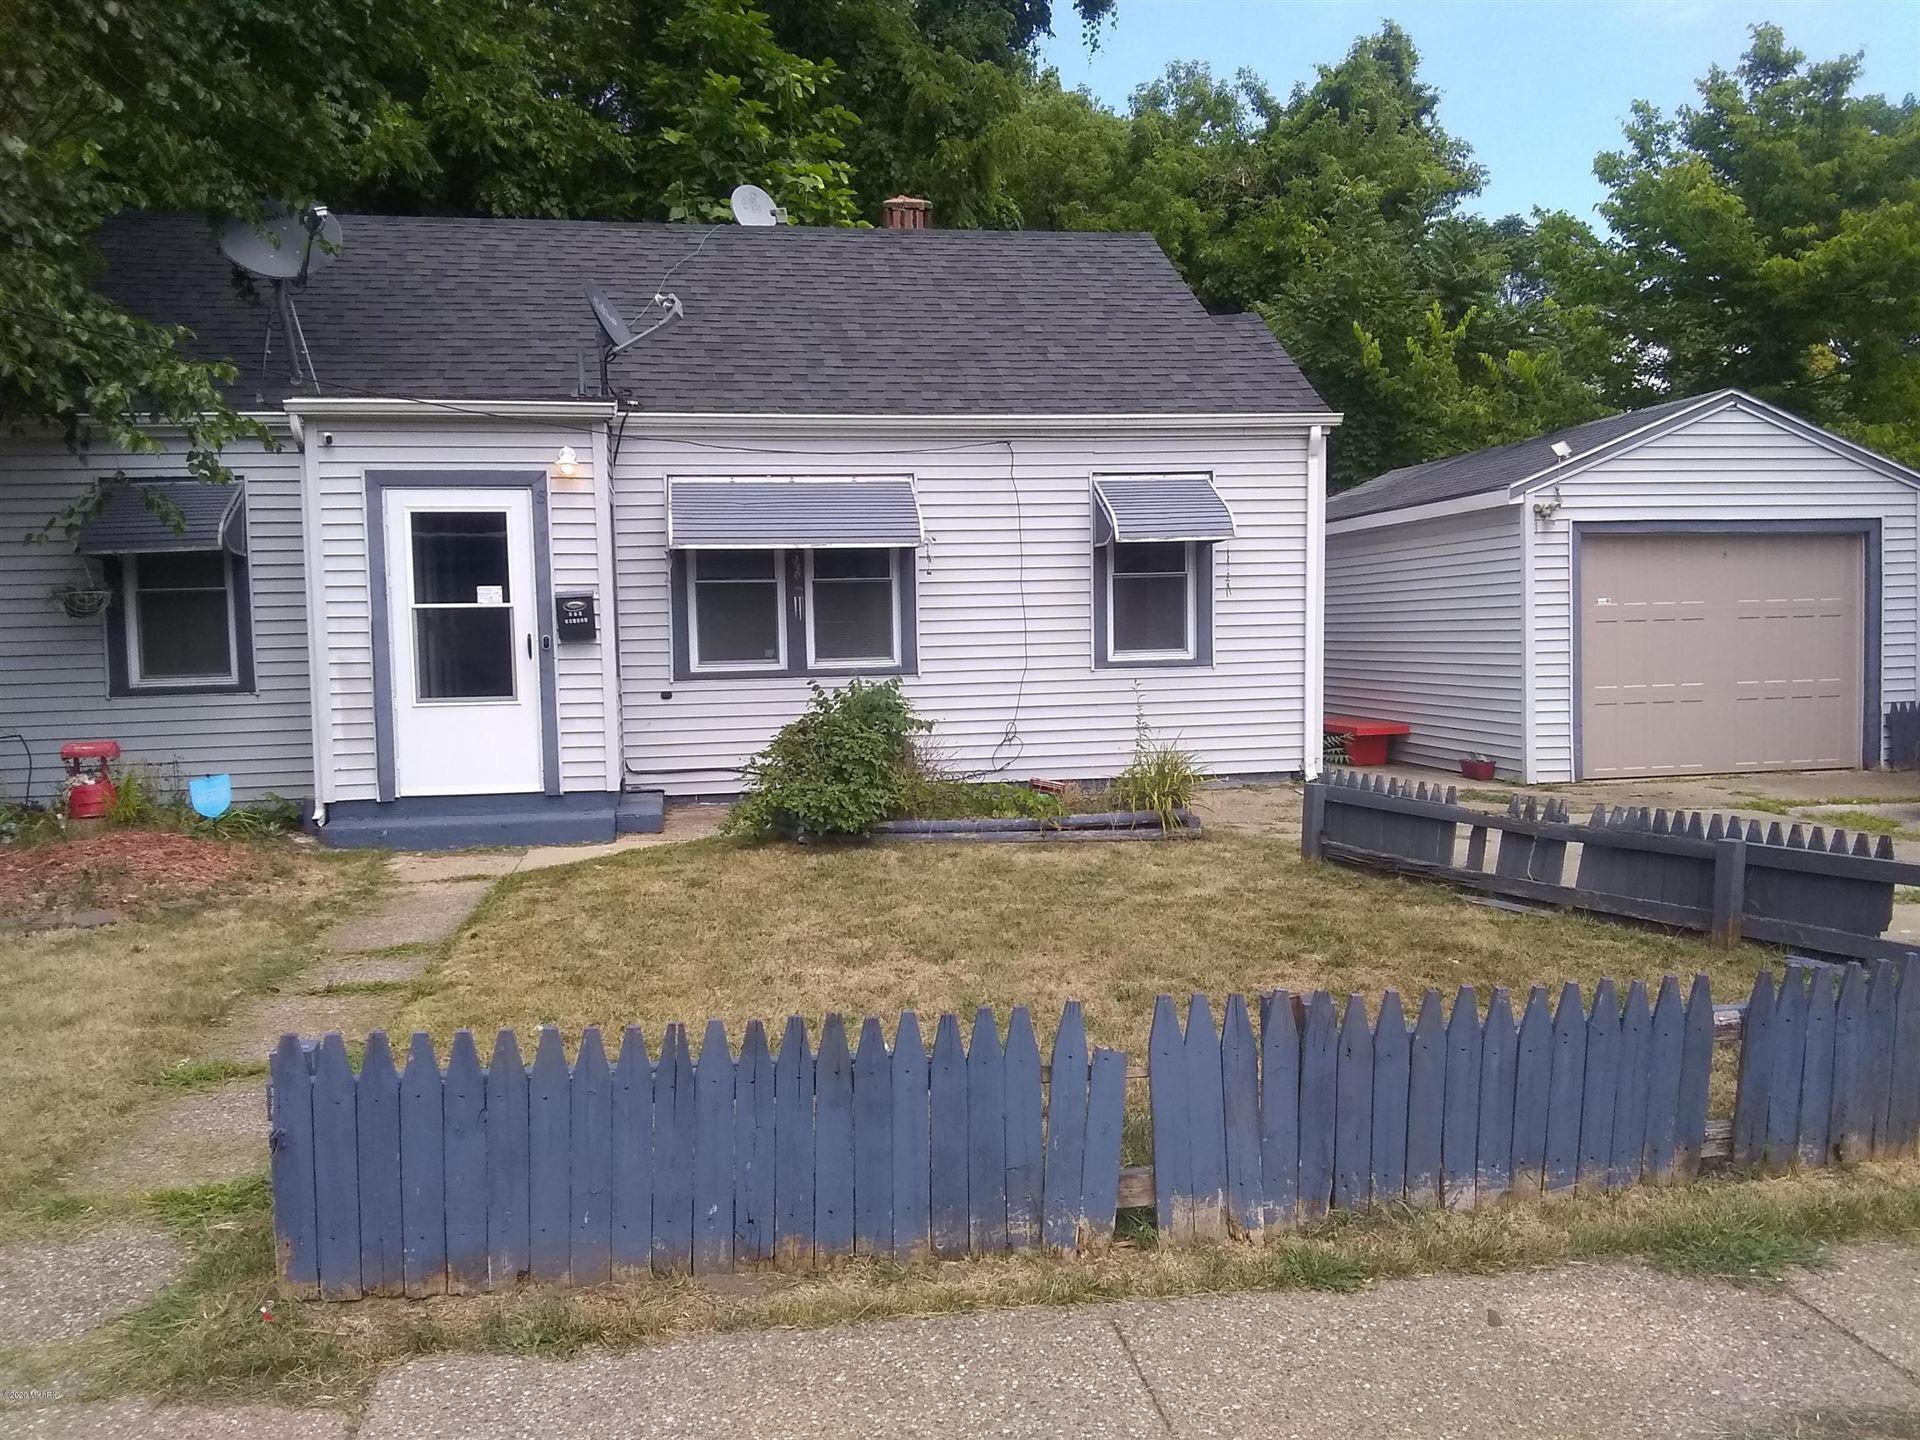 857 Pipestone Street, Benton Harbor, MI 49022 - MLS#: 20030123